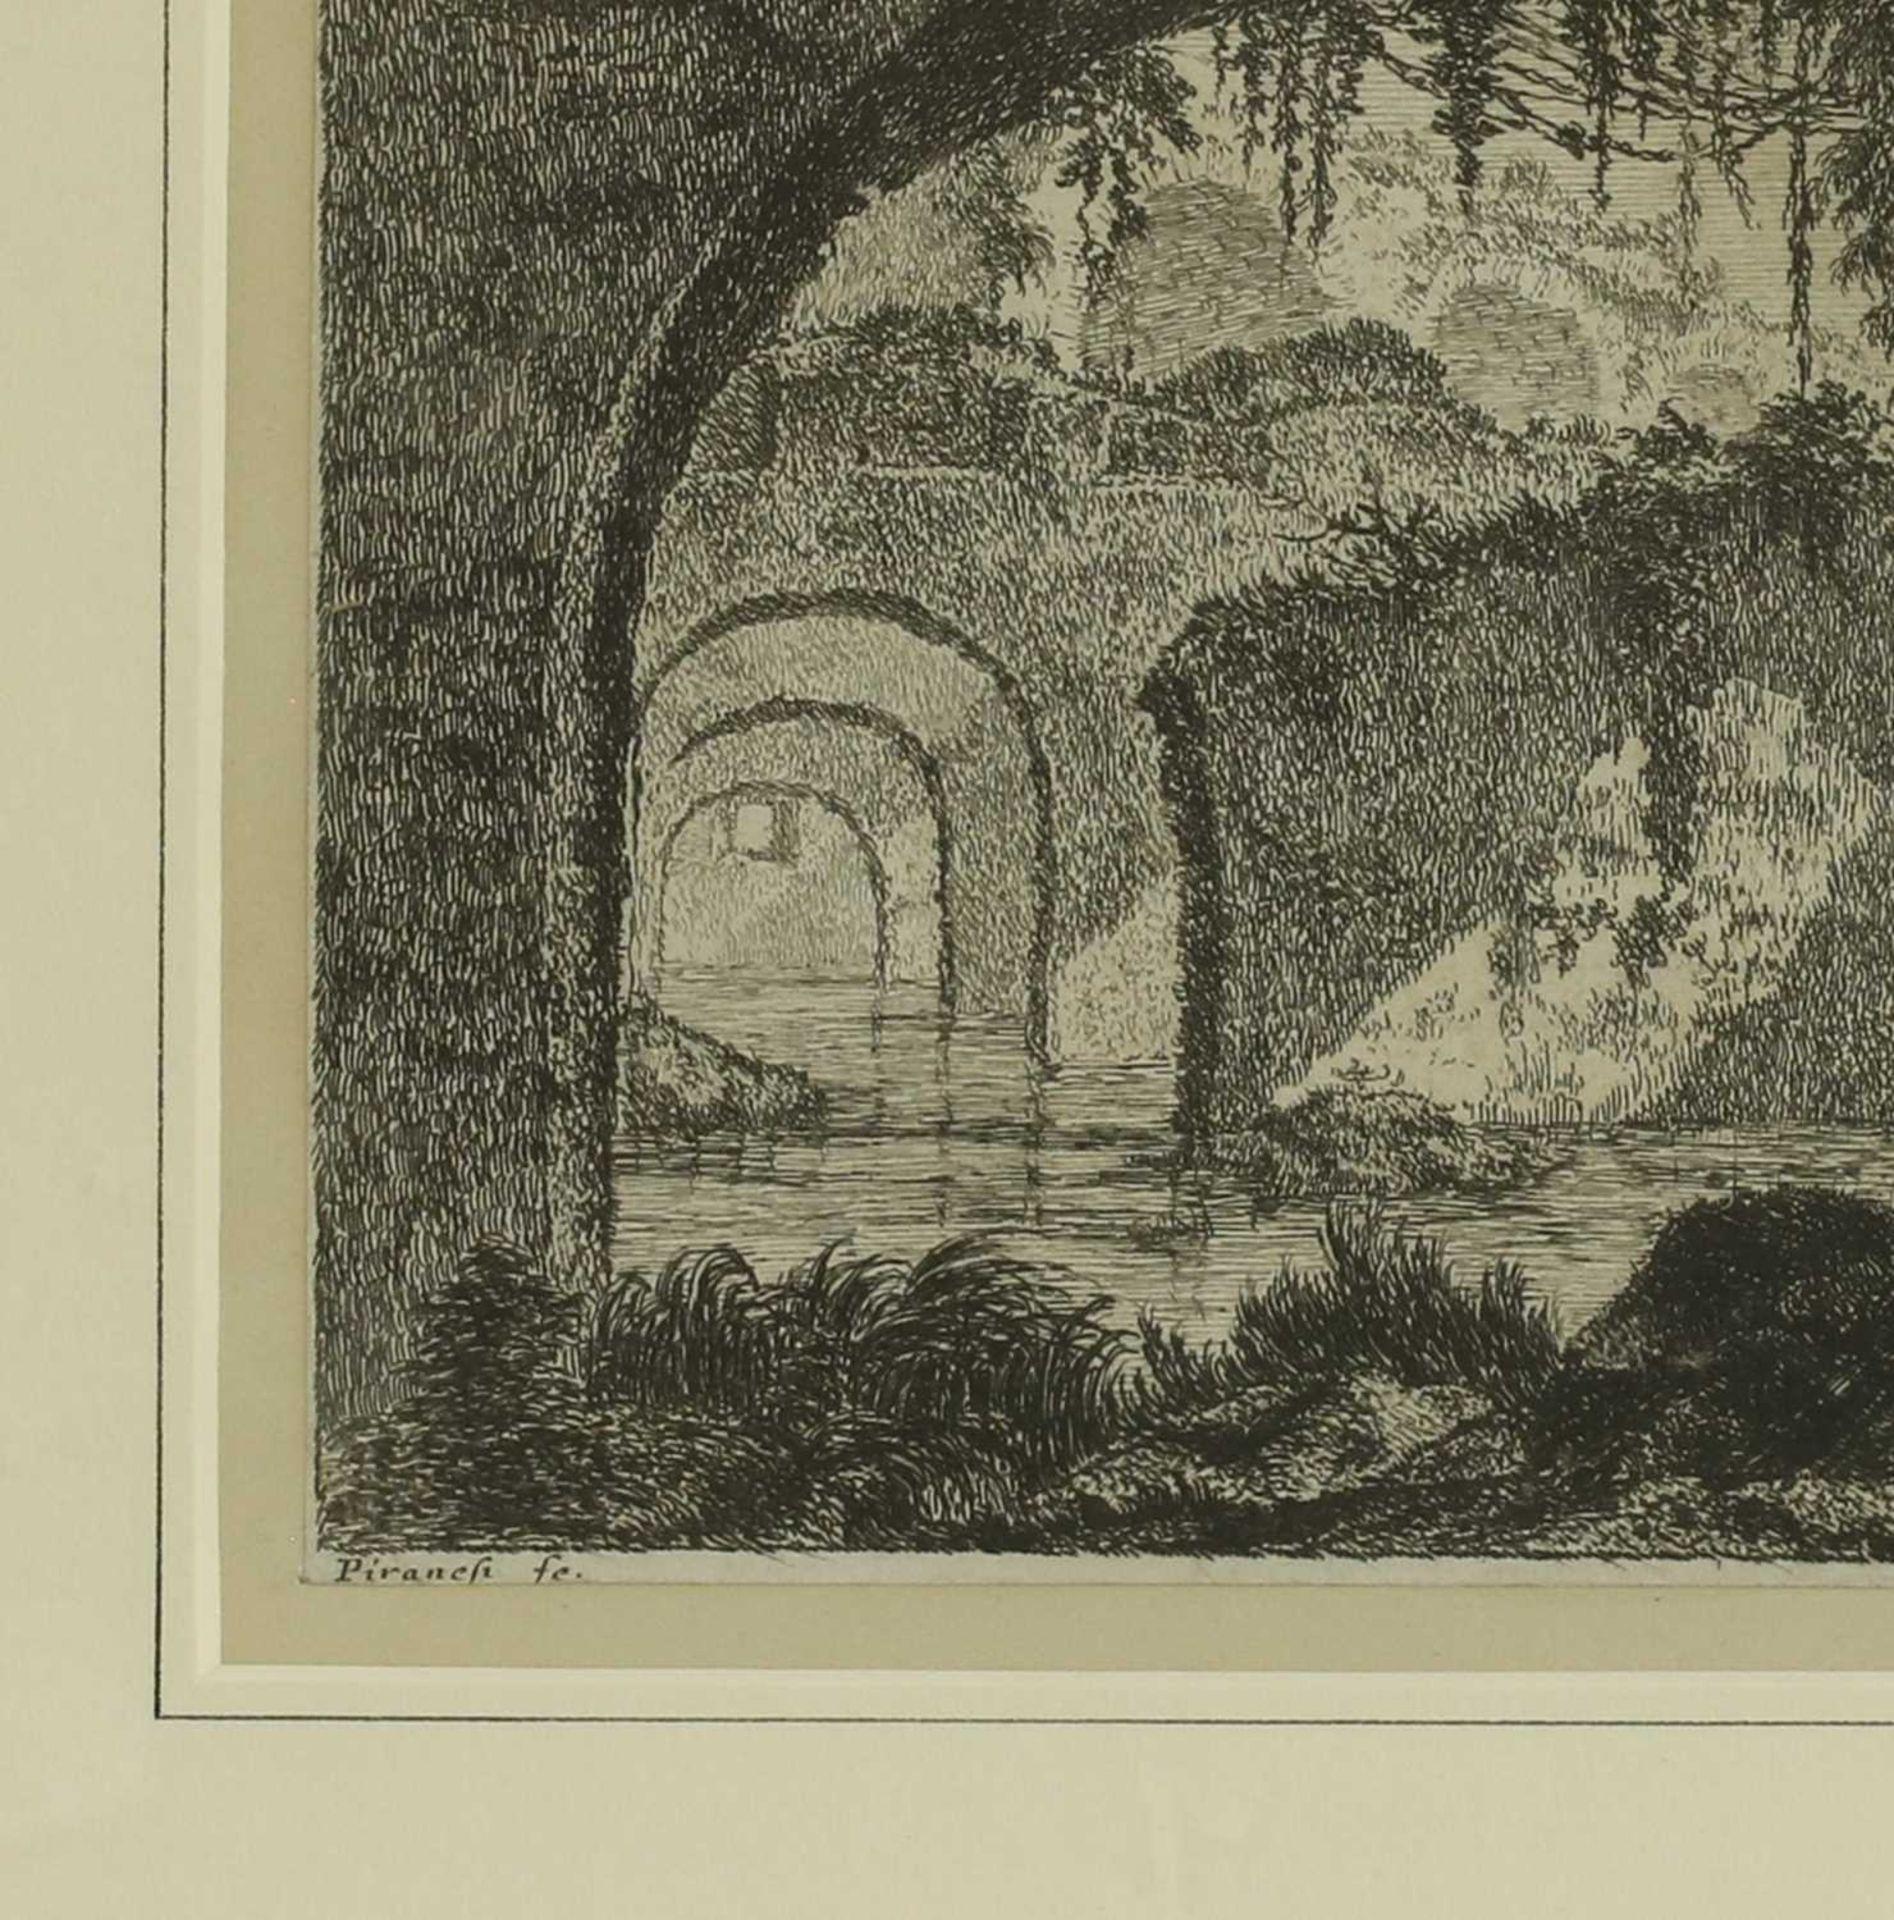 Giovanni Battista Piranesi (Italian, 1720-1778) - Image 4 of 4